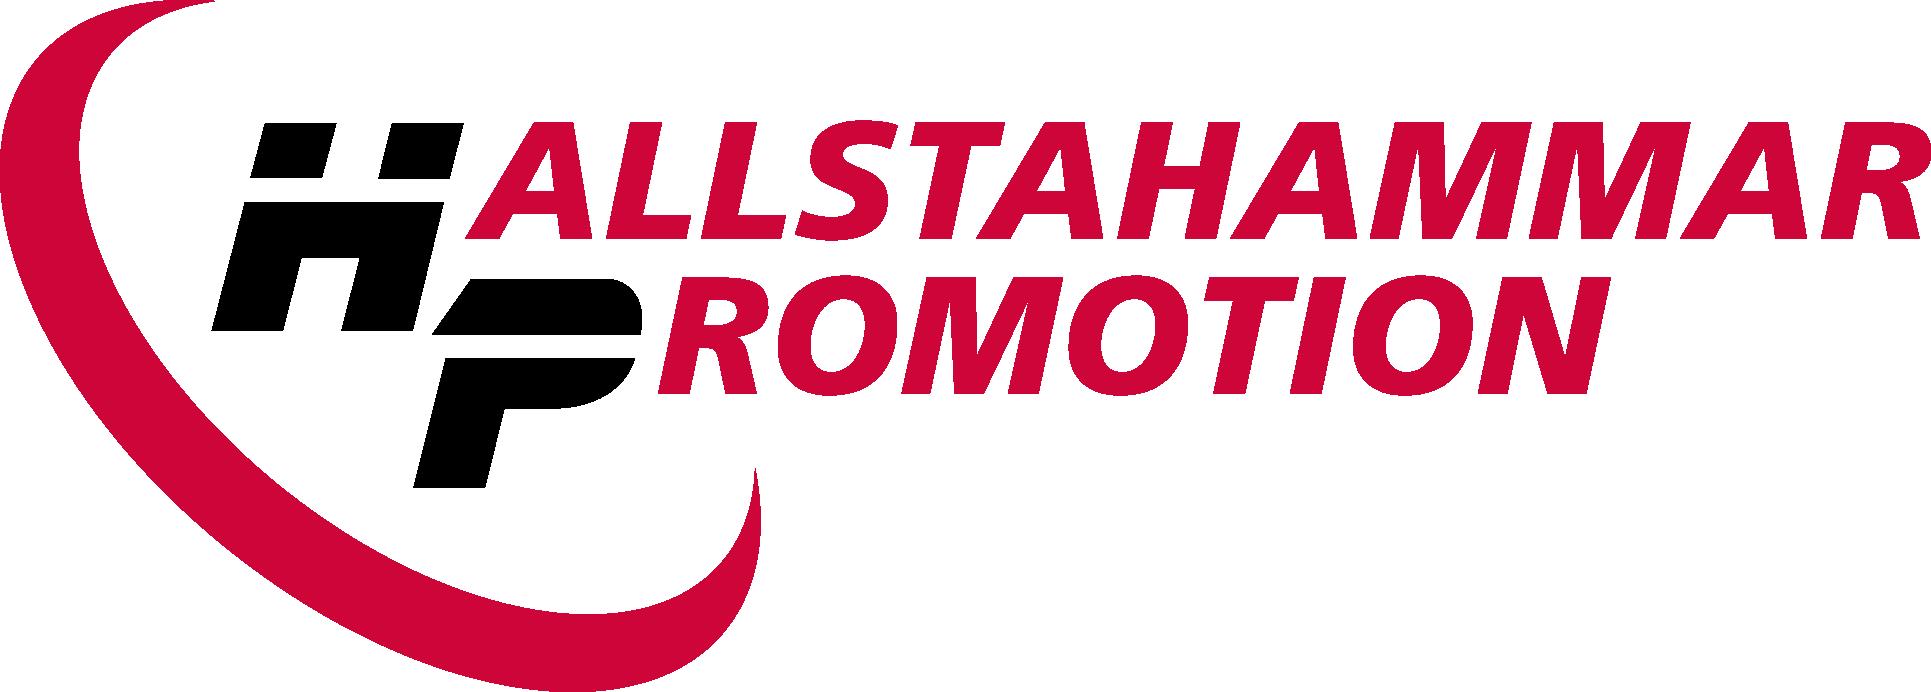 hallstapromo-logo.png